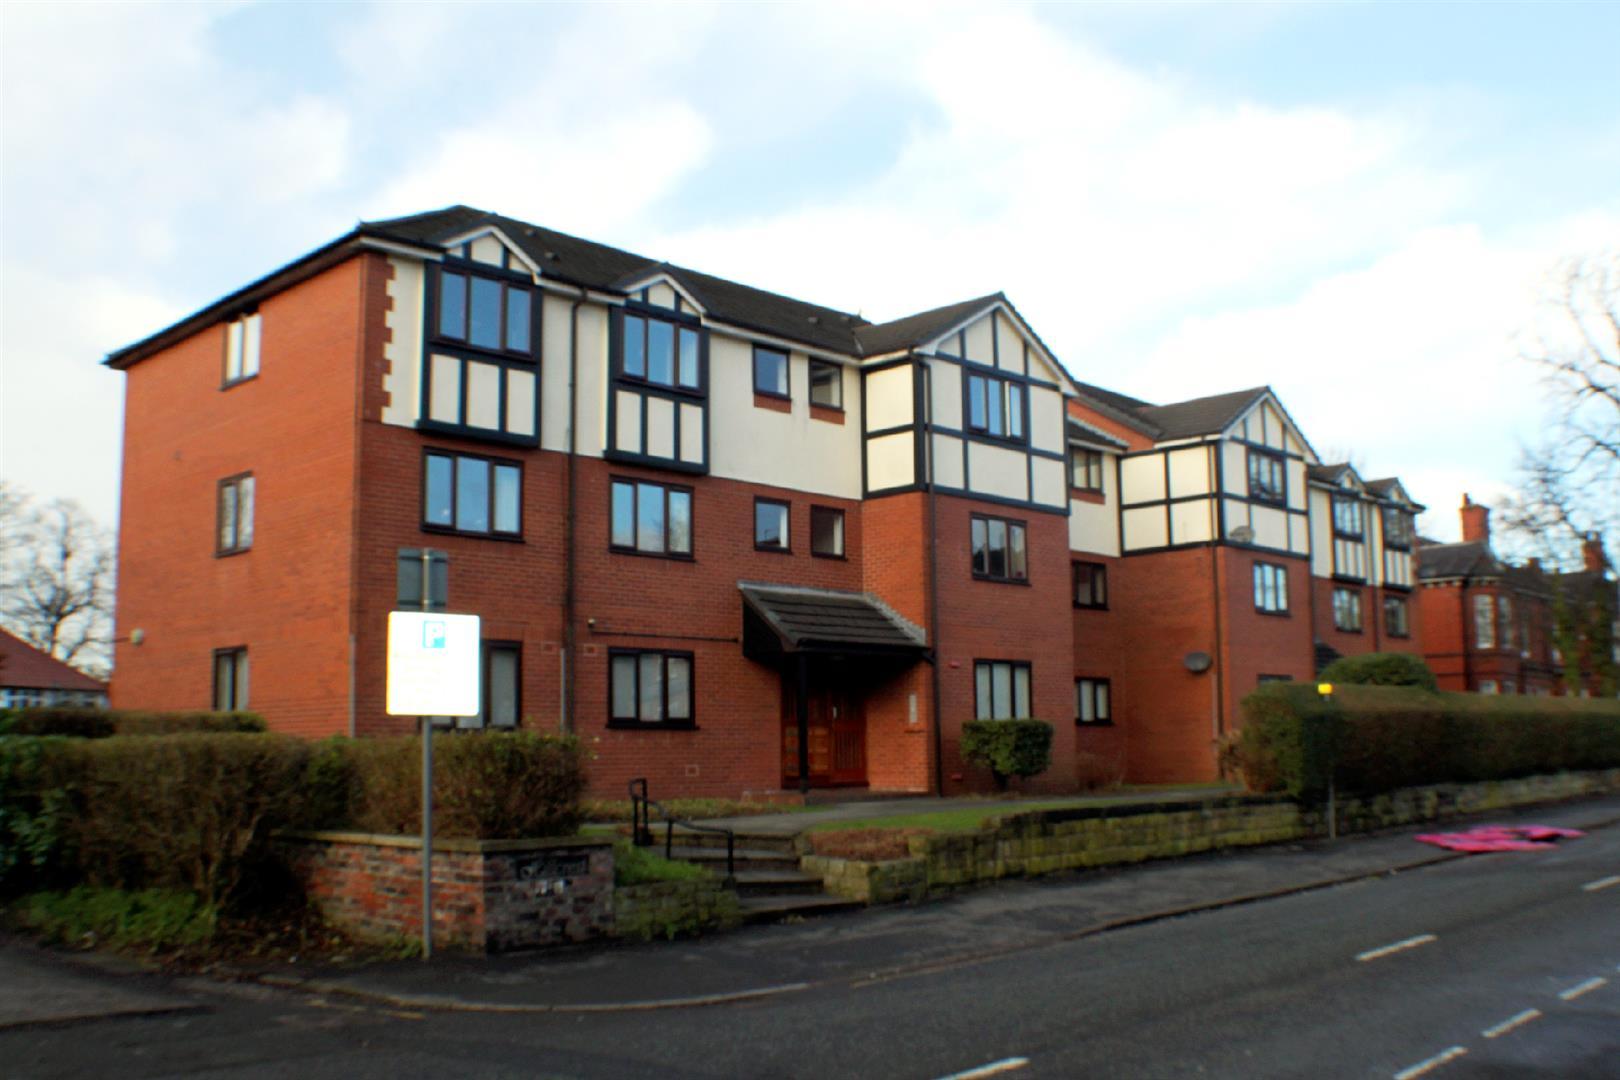 2 Bedrooms Flat for sale in Hillcrest, Park Road, Salford